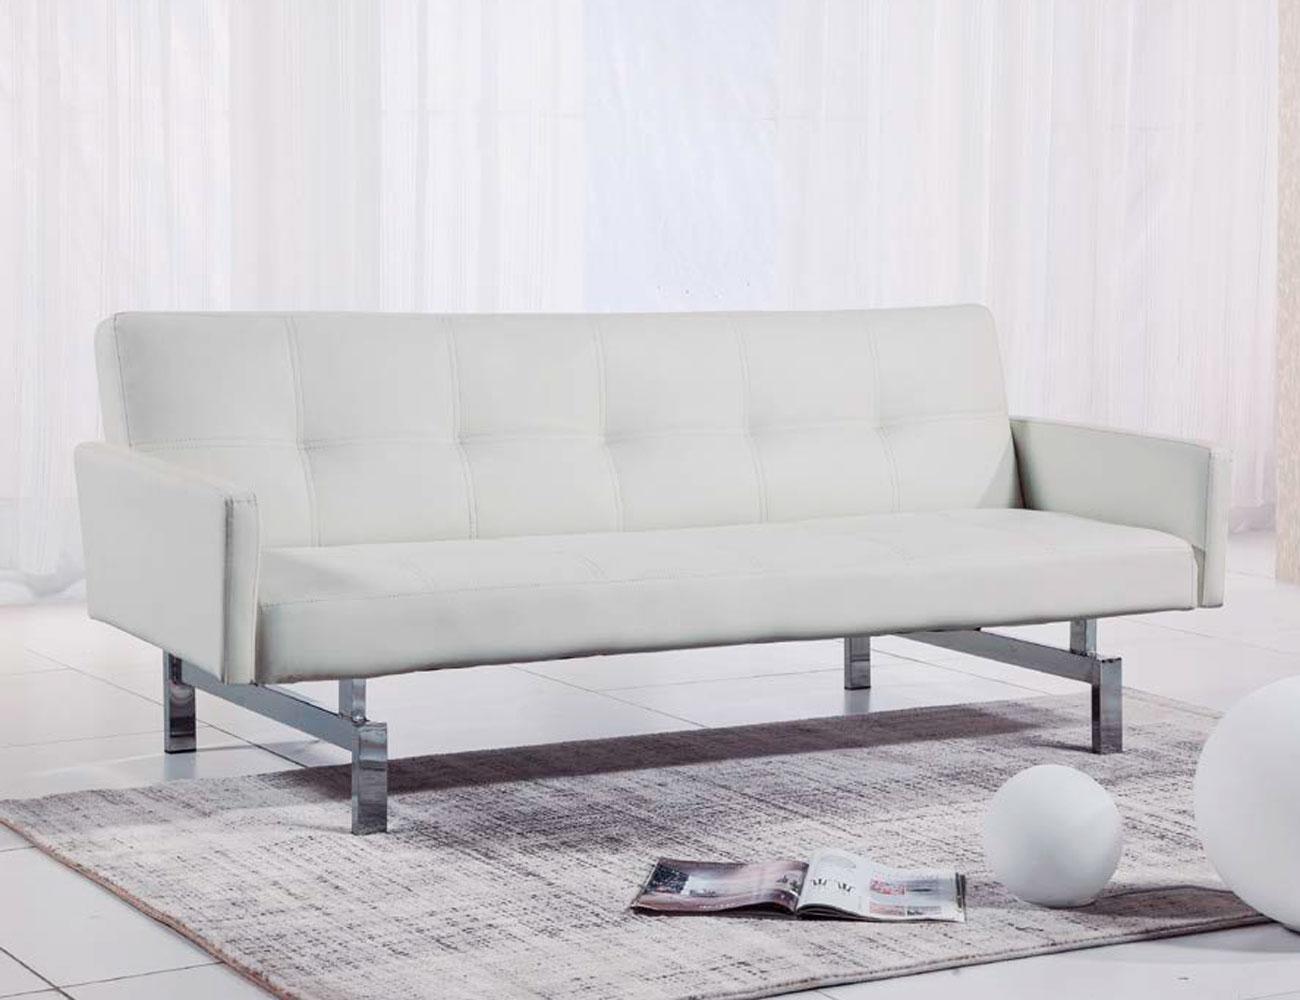 Sofa cama con brazos simil piel blanco